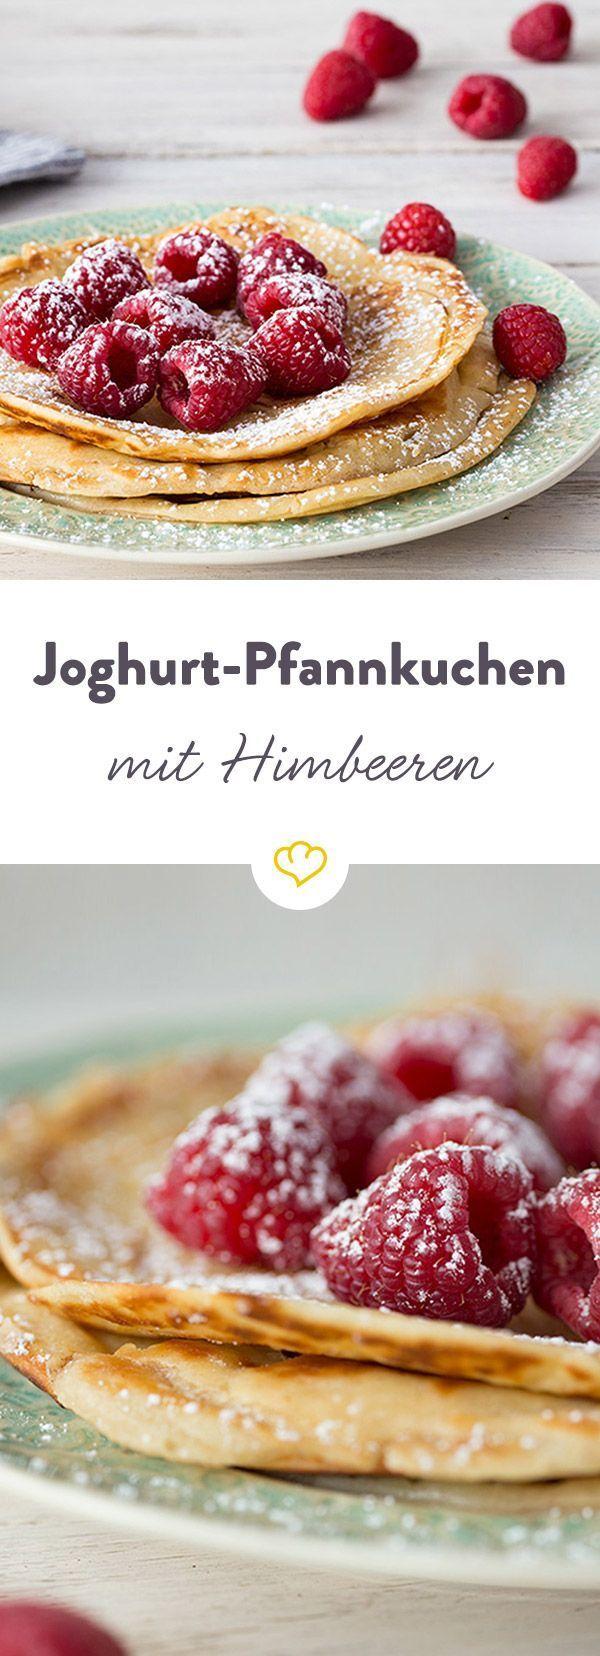 Yogurt pancakes with raspberries